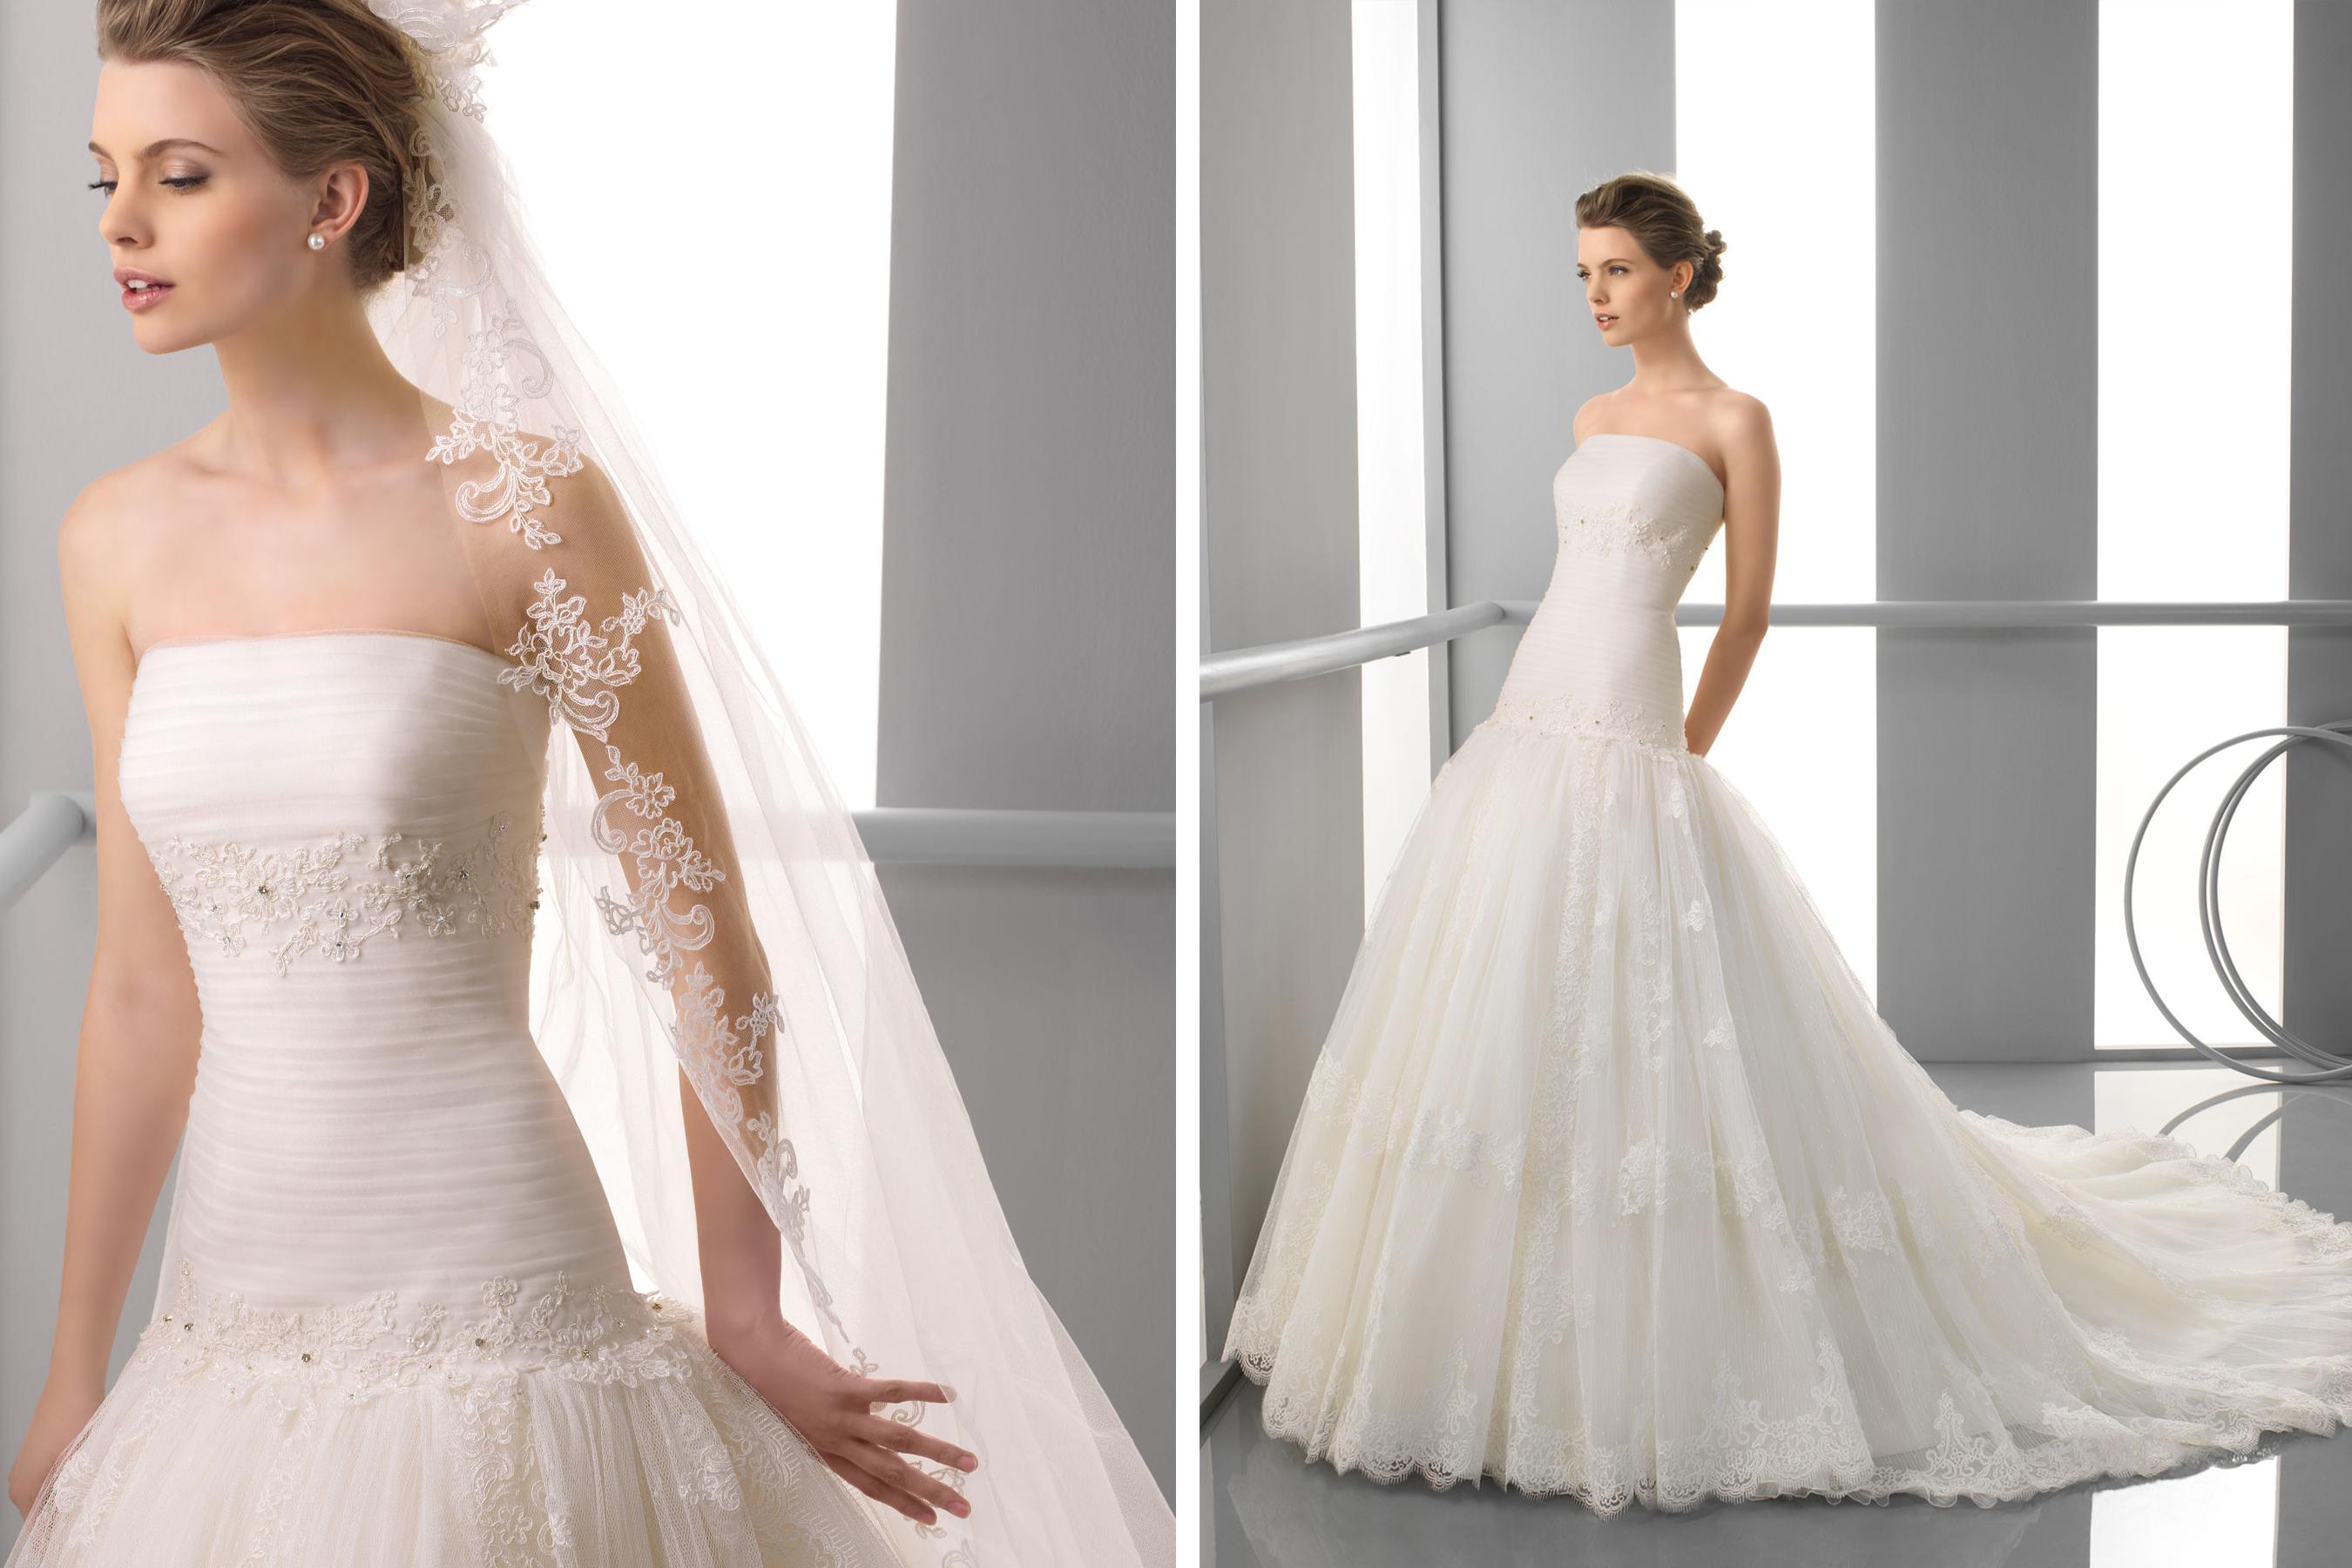 Alma novia wedding dress 2013 bridal faustine for Alma novia wedding dress